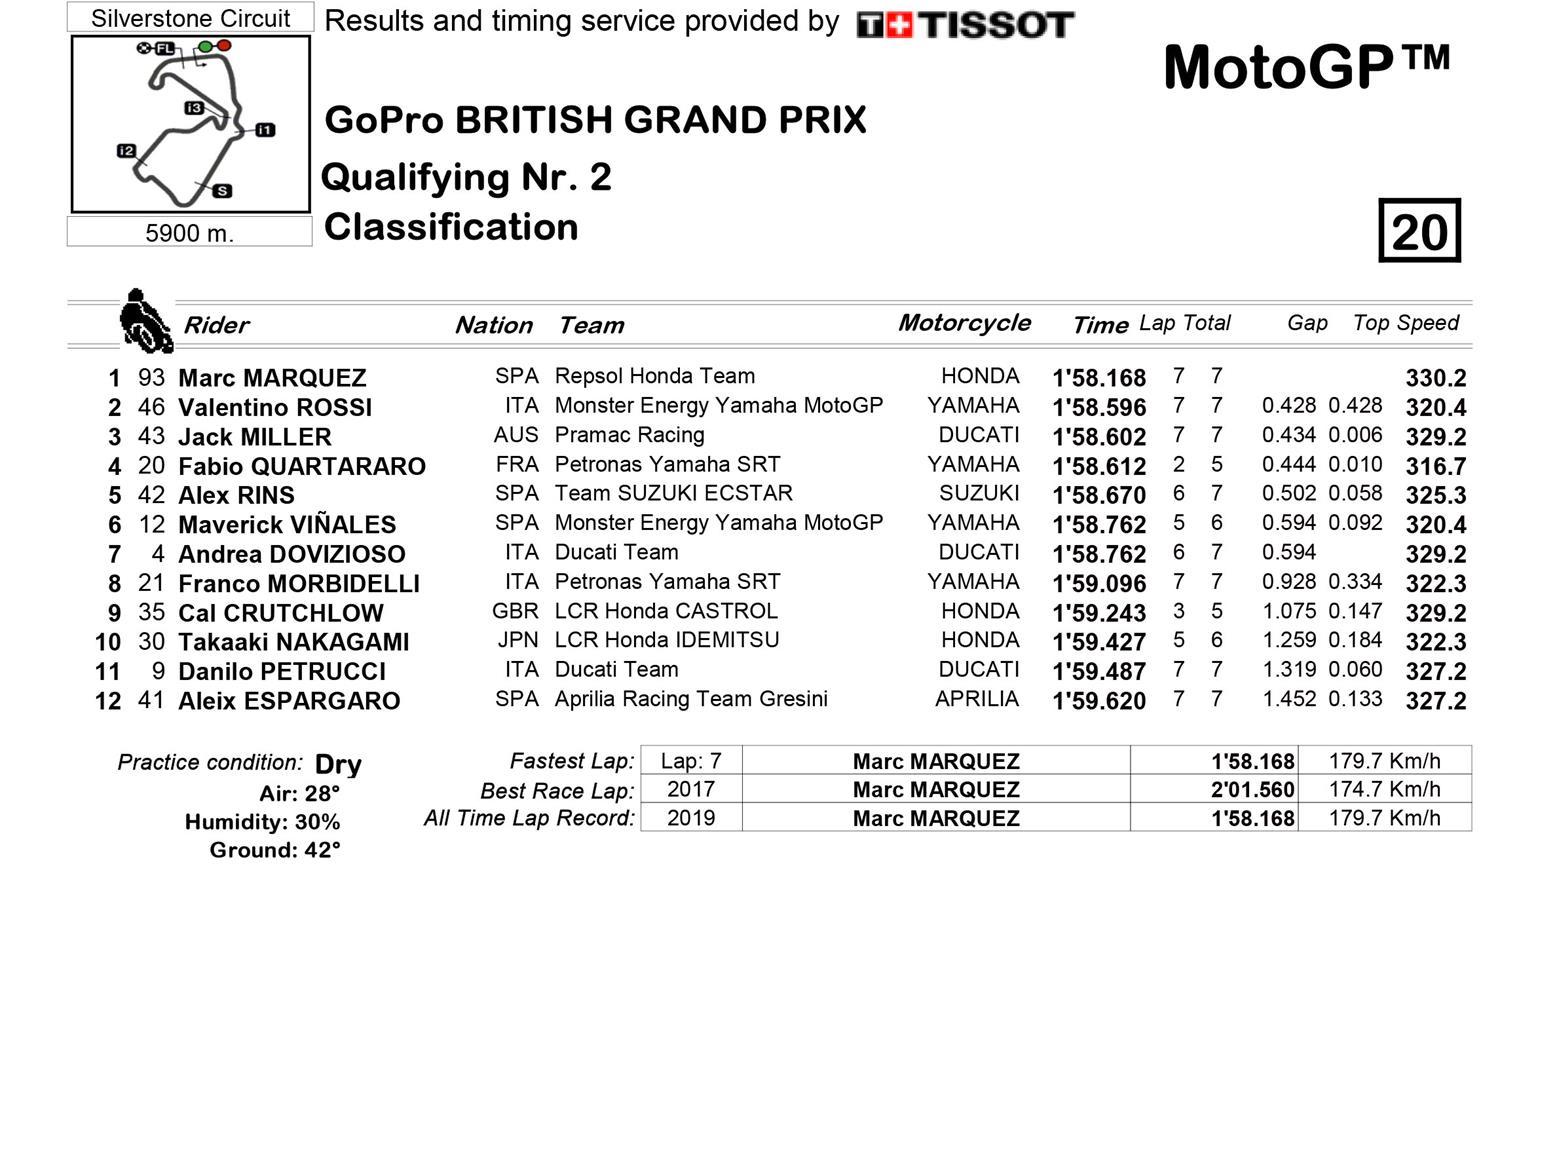 MotoGP Q2 classification